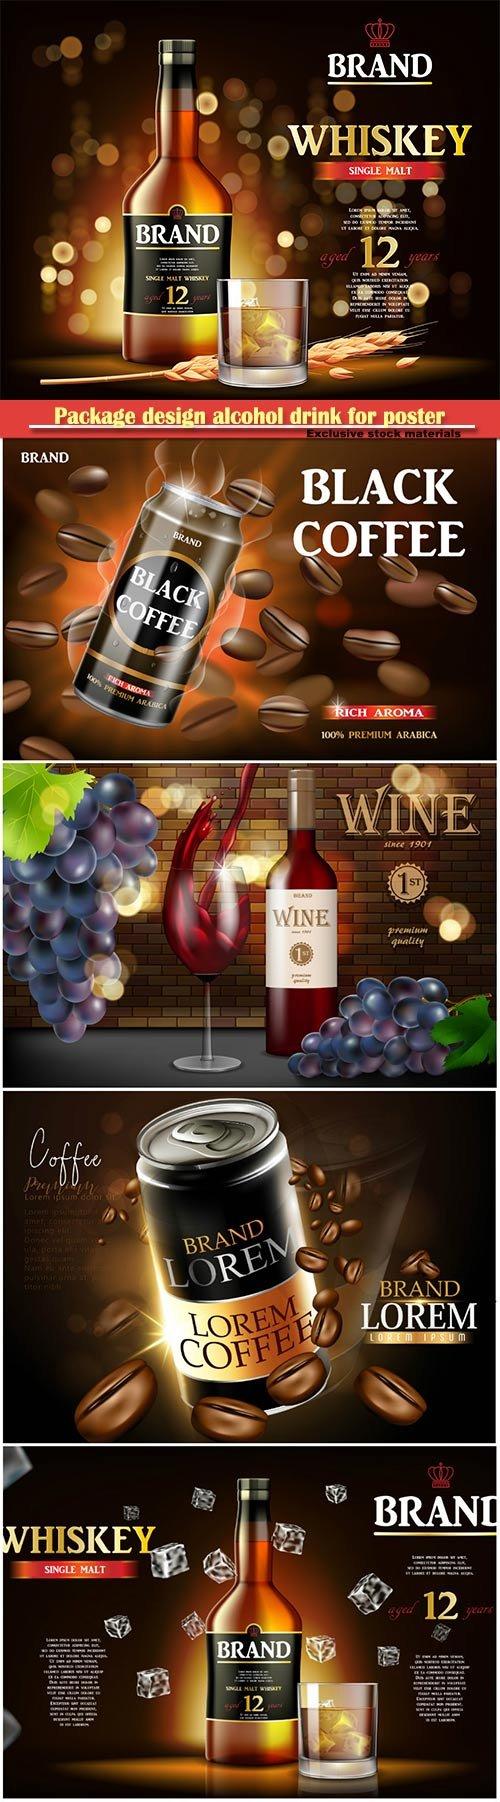 Package design alcohol drink for poster or banner, realistic mockup vector 3d illustration